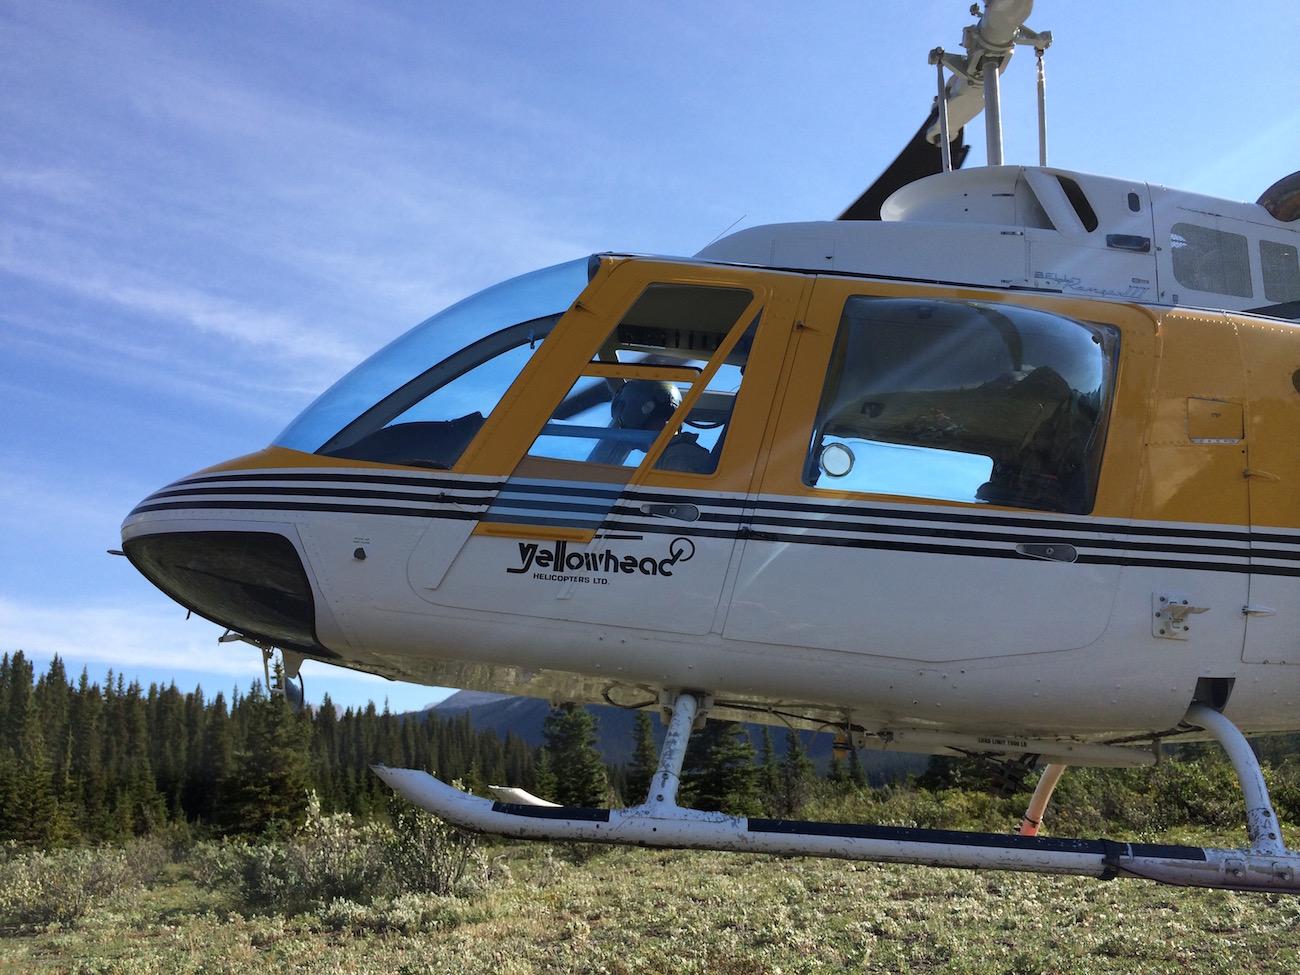 Mit dem Helikopter geht es los zum Heli-Hike am Mount Robson (Foto: Lisa Feldmann, Das Valemount).